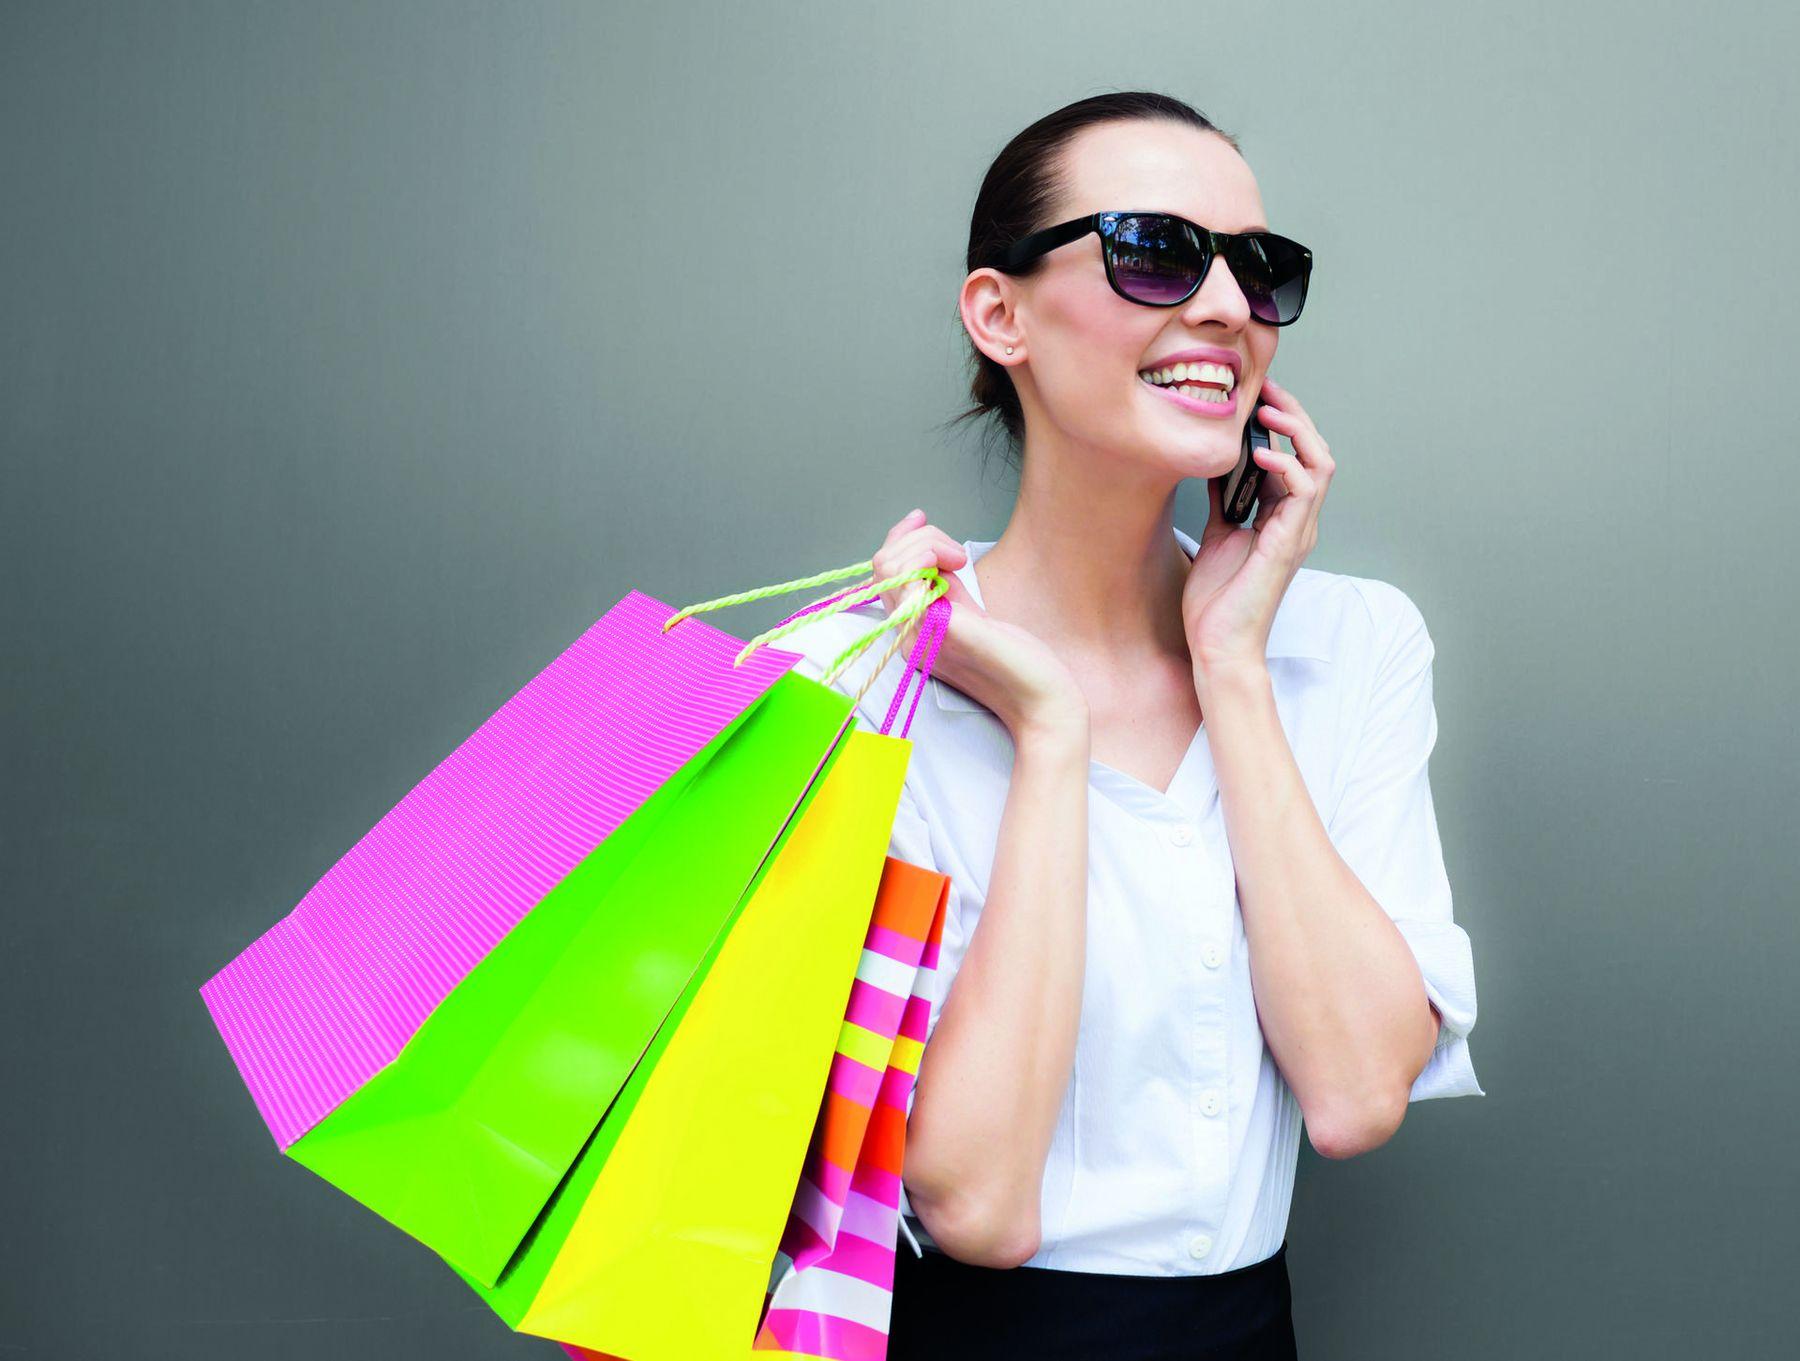 Shopping iStock 467615432